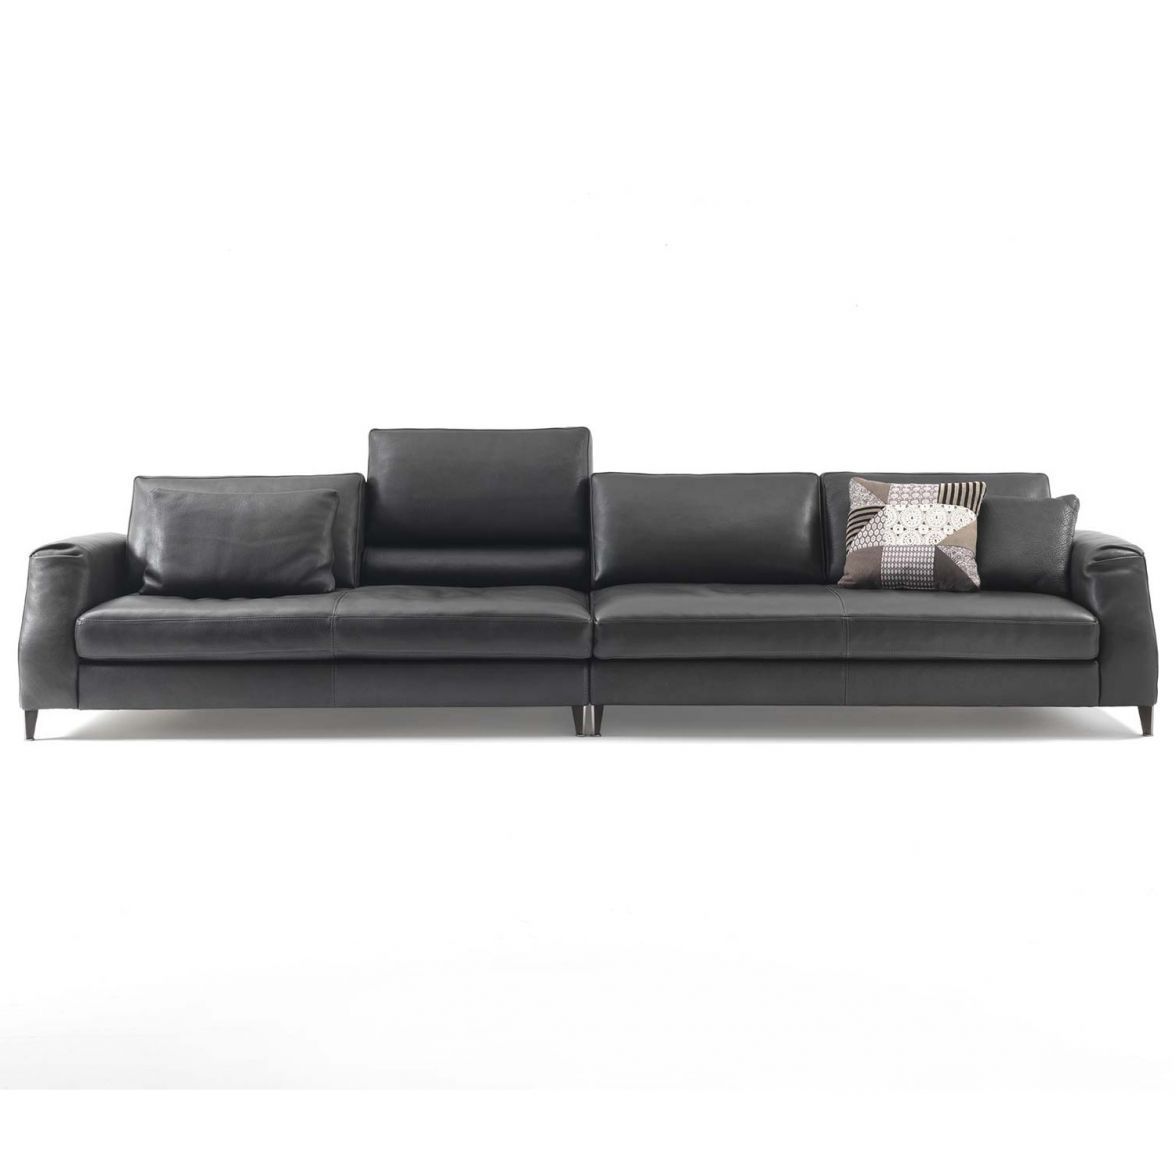 Davis Class sofa фото цена